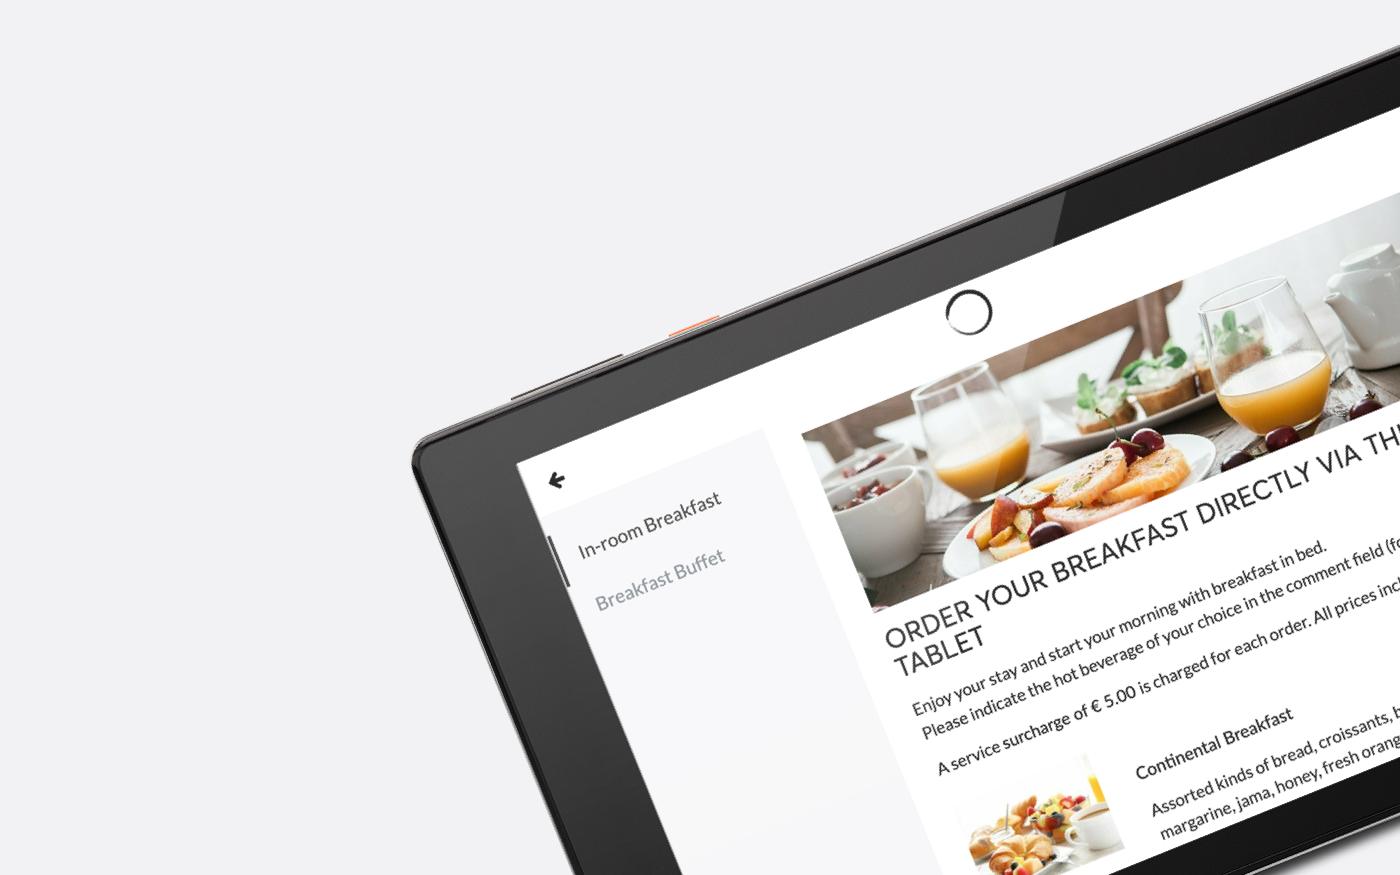 SuitePad & COVID-19: order breakfast via the tablet